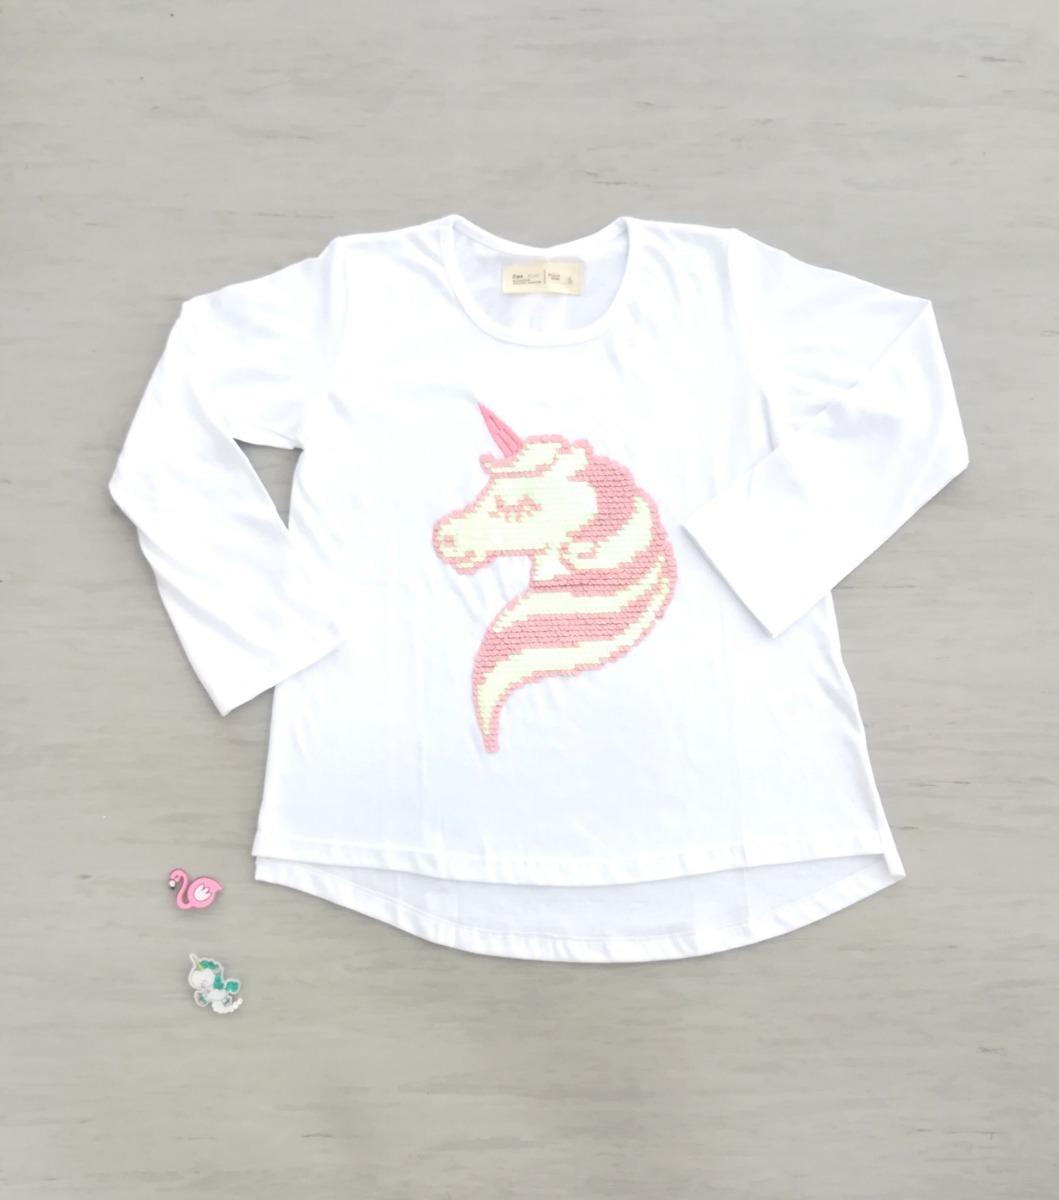 b8600f2c3 remera unicornio lentejuelas reversibles niña nena ropa. Cargando zoom.